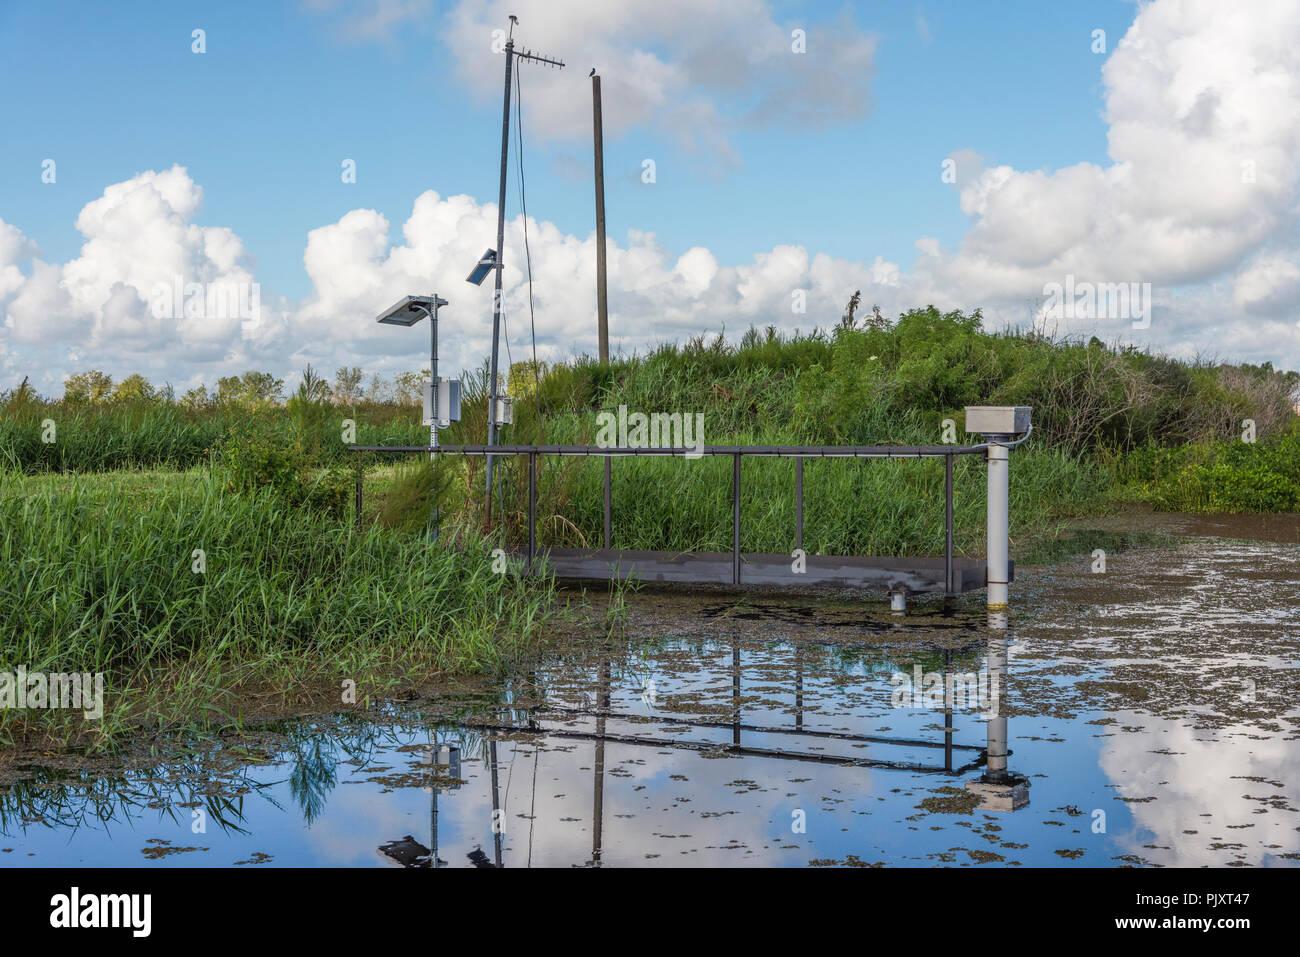 Water Level Monitoring Station - Stock Image